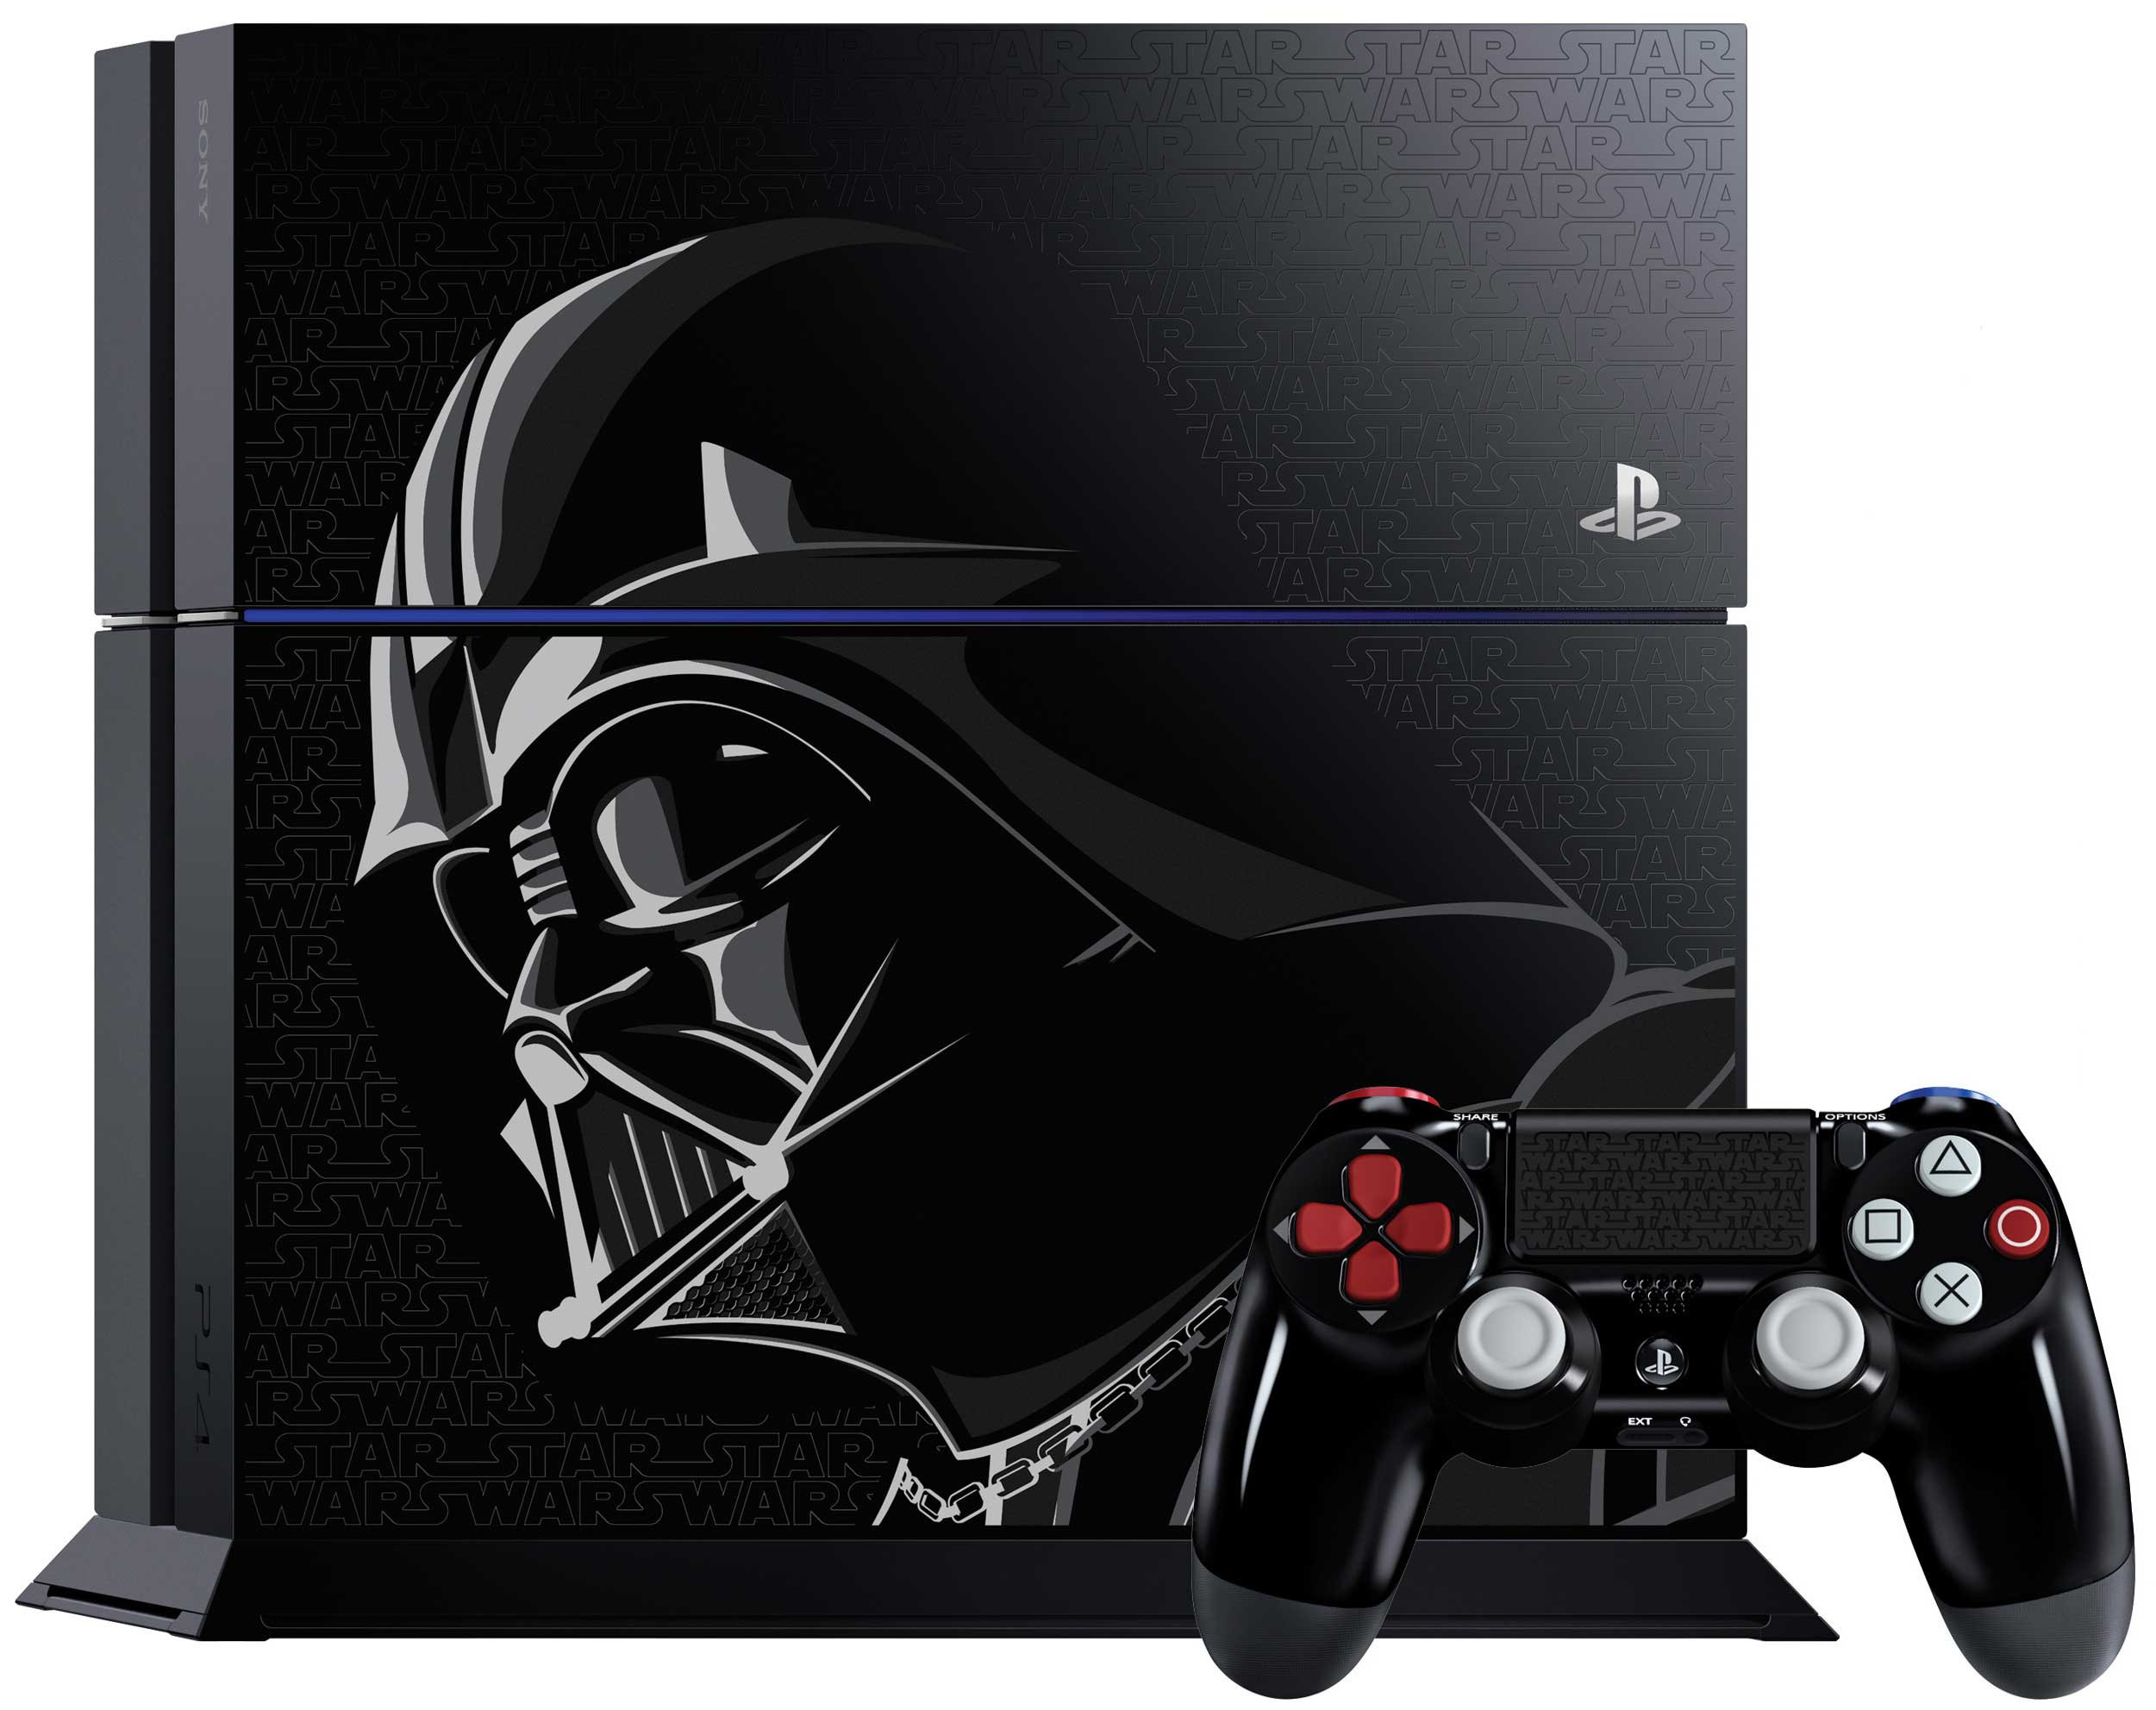 Star Wars Battlefront Console Bundle Includes Super Sexy